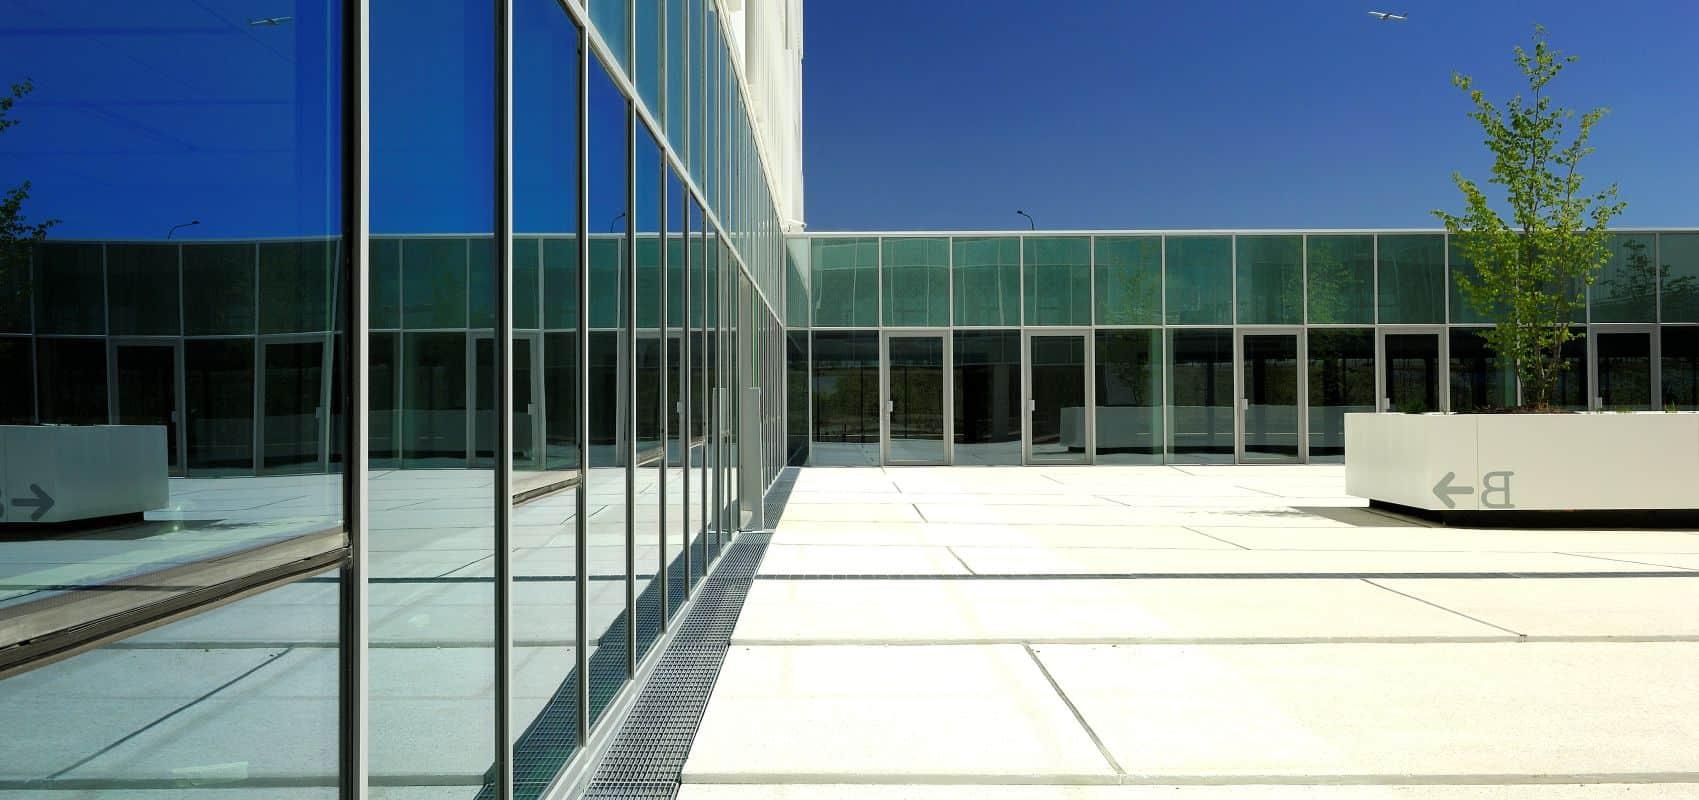 Art-n-Glass Minimo AX-F32 cw Panorama Design Façades System